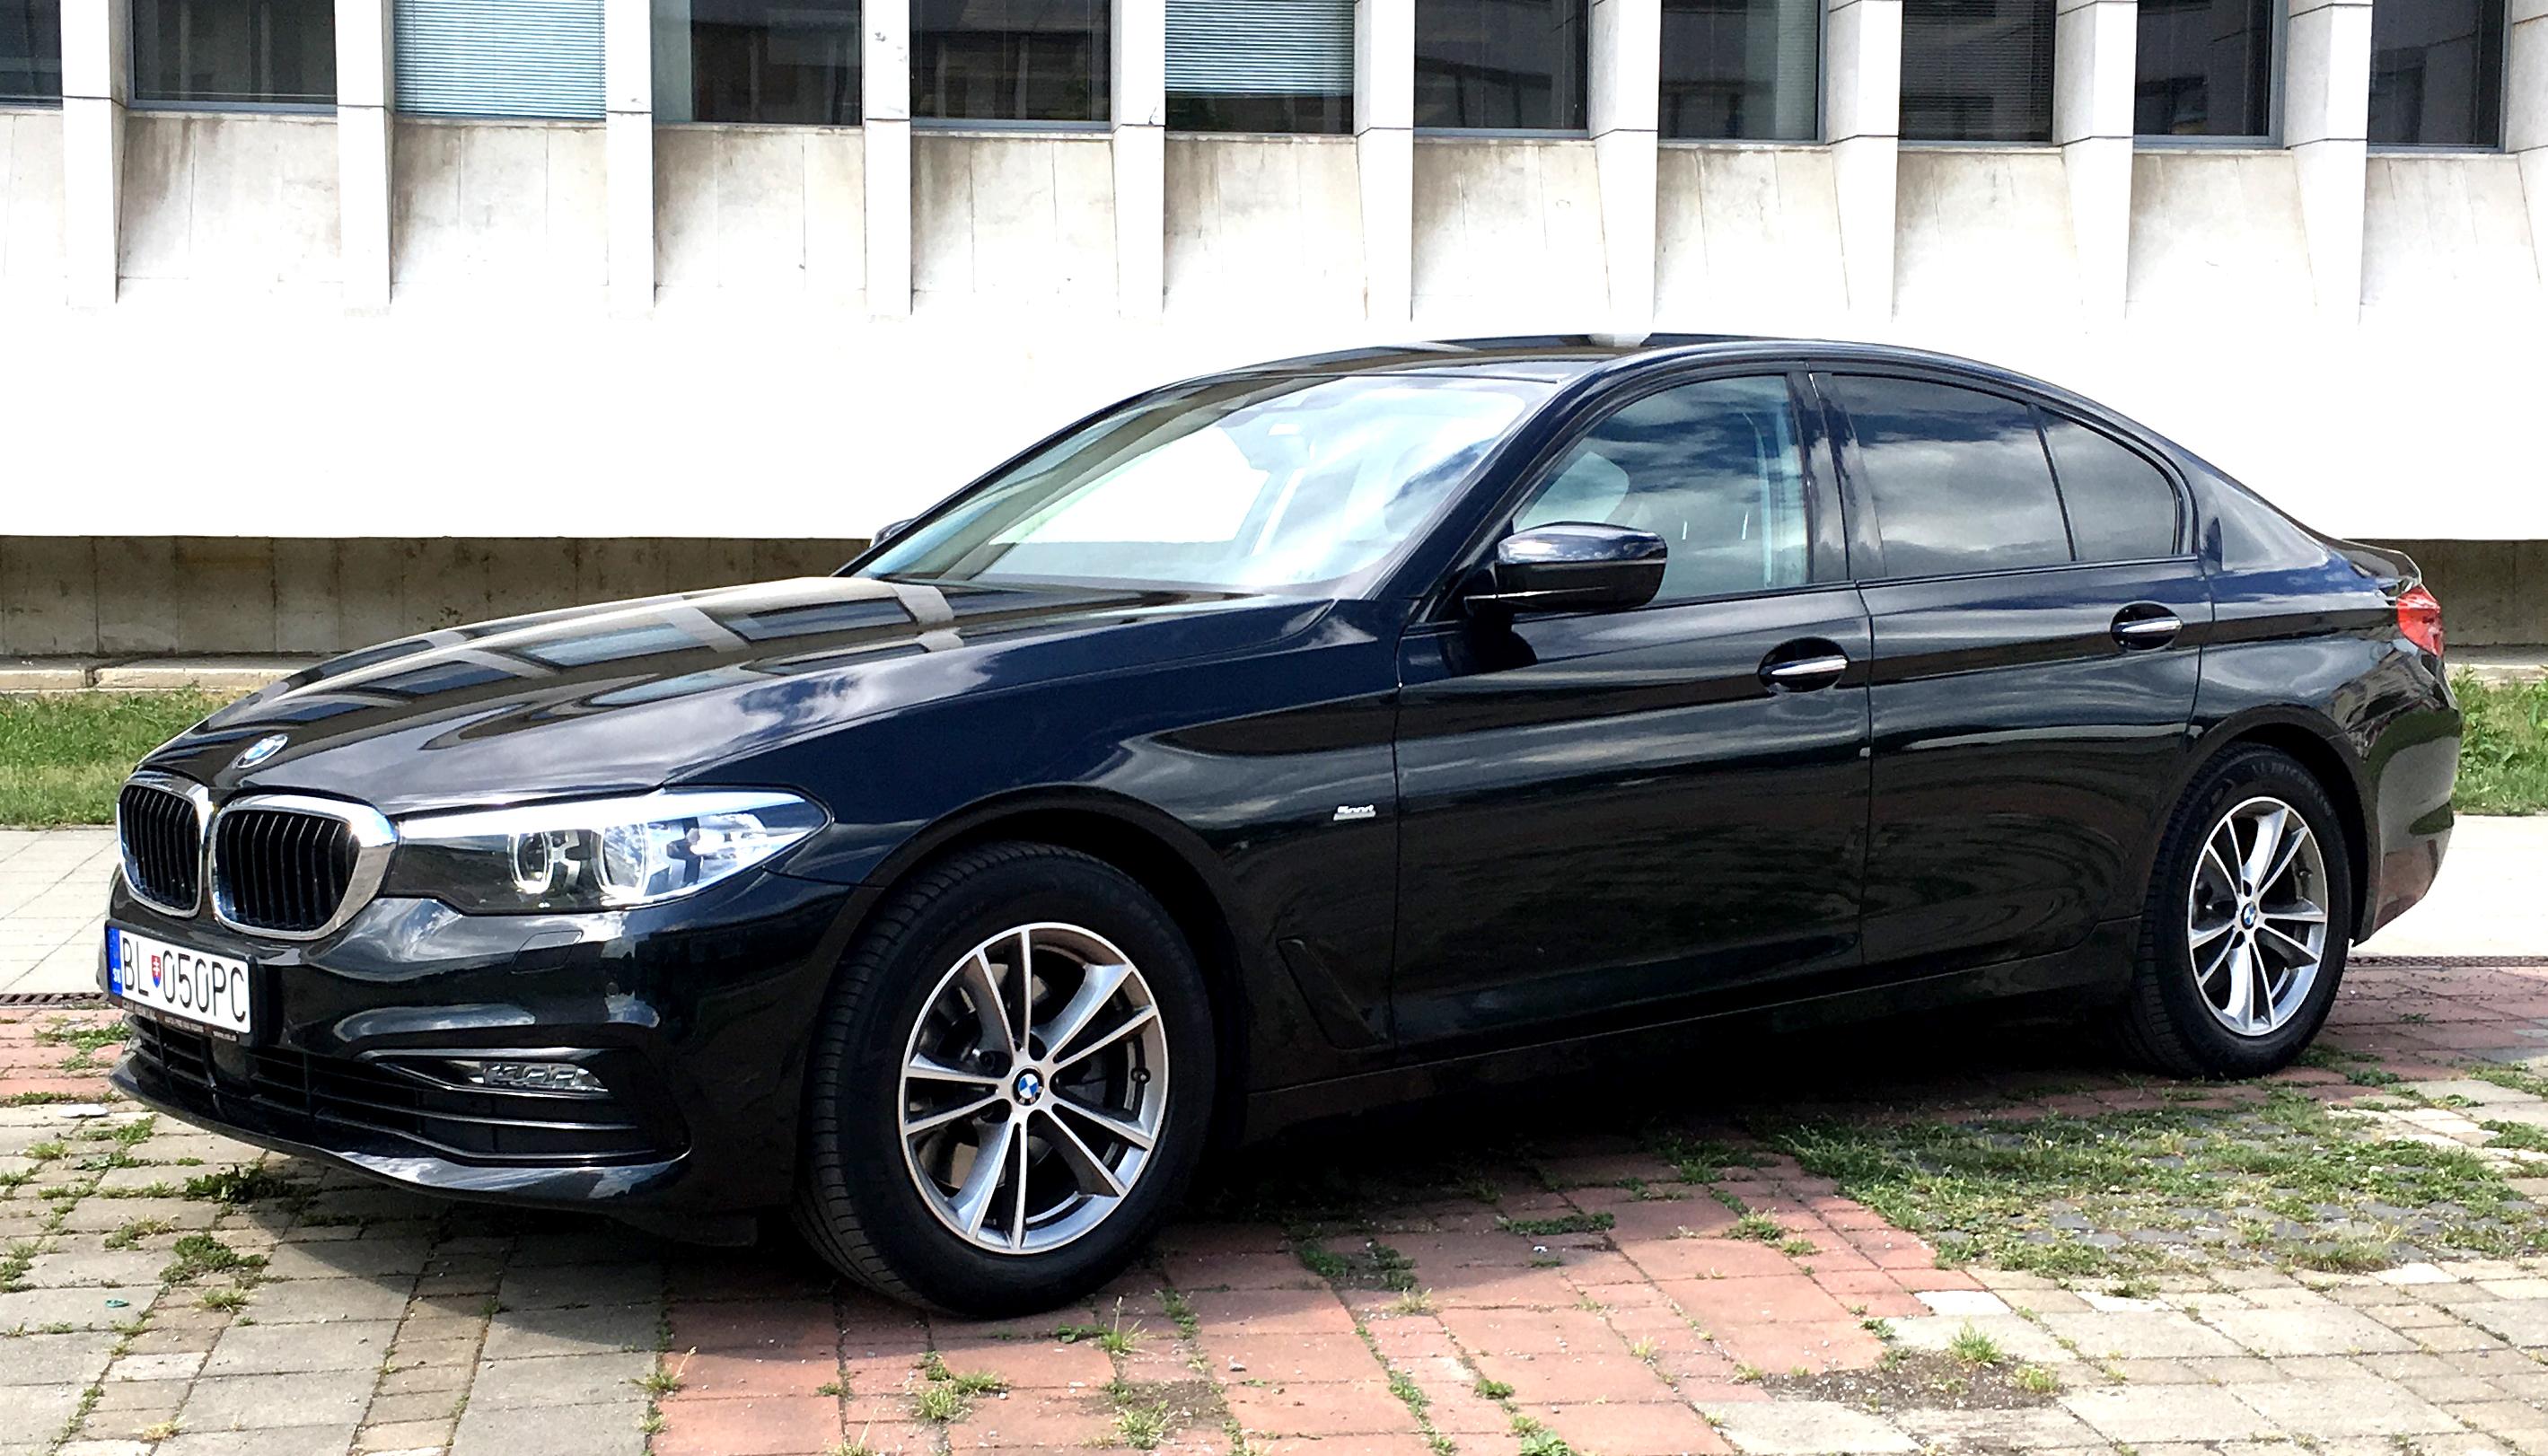 luxury car zilina  Rent a car BMW 520 d xDrive Limousine SportLine 2017 AT NEW - Rai ...